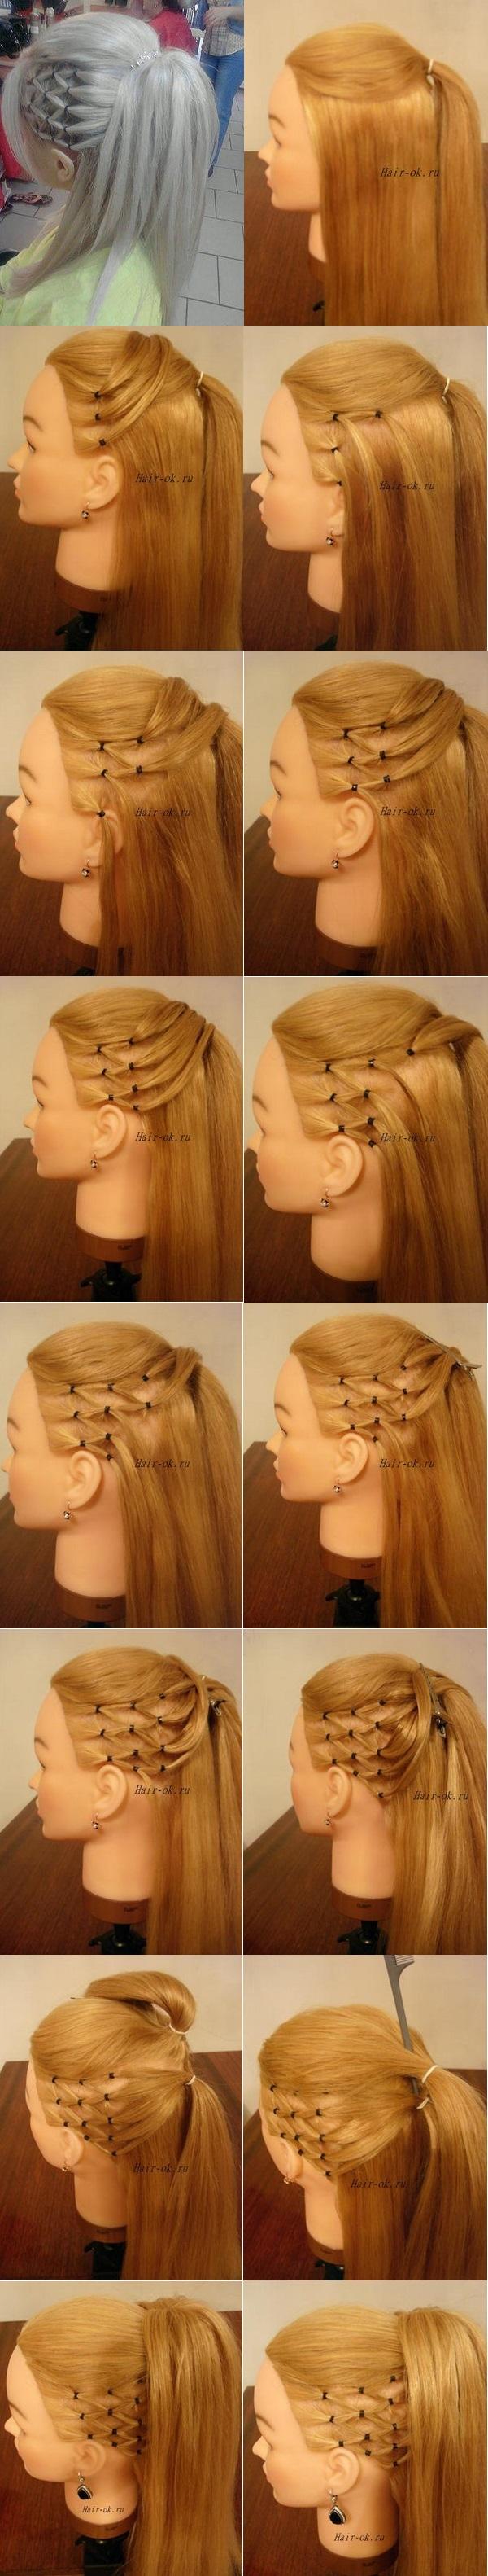 elegant hairstyle idea